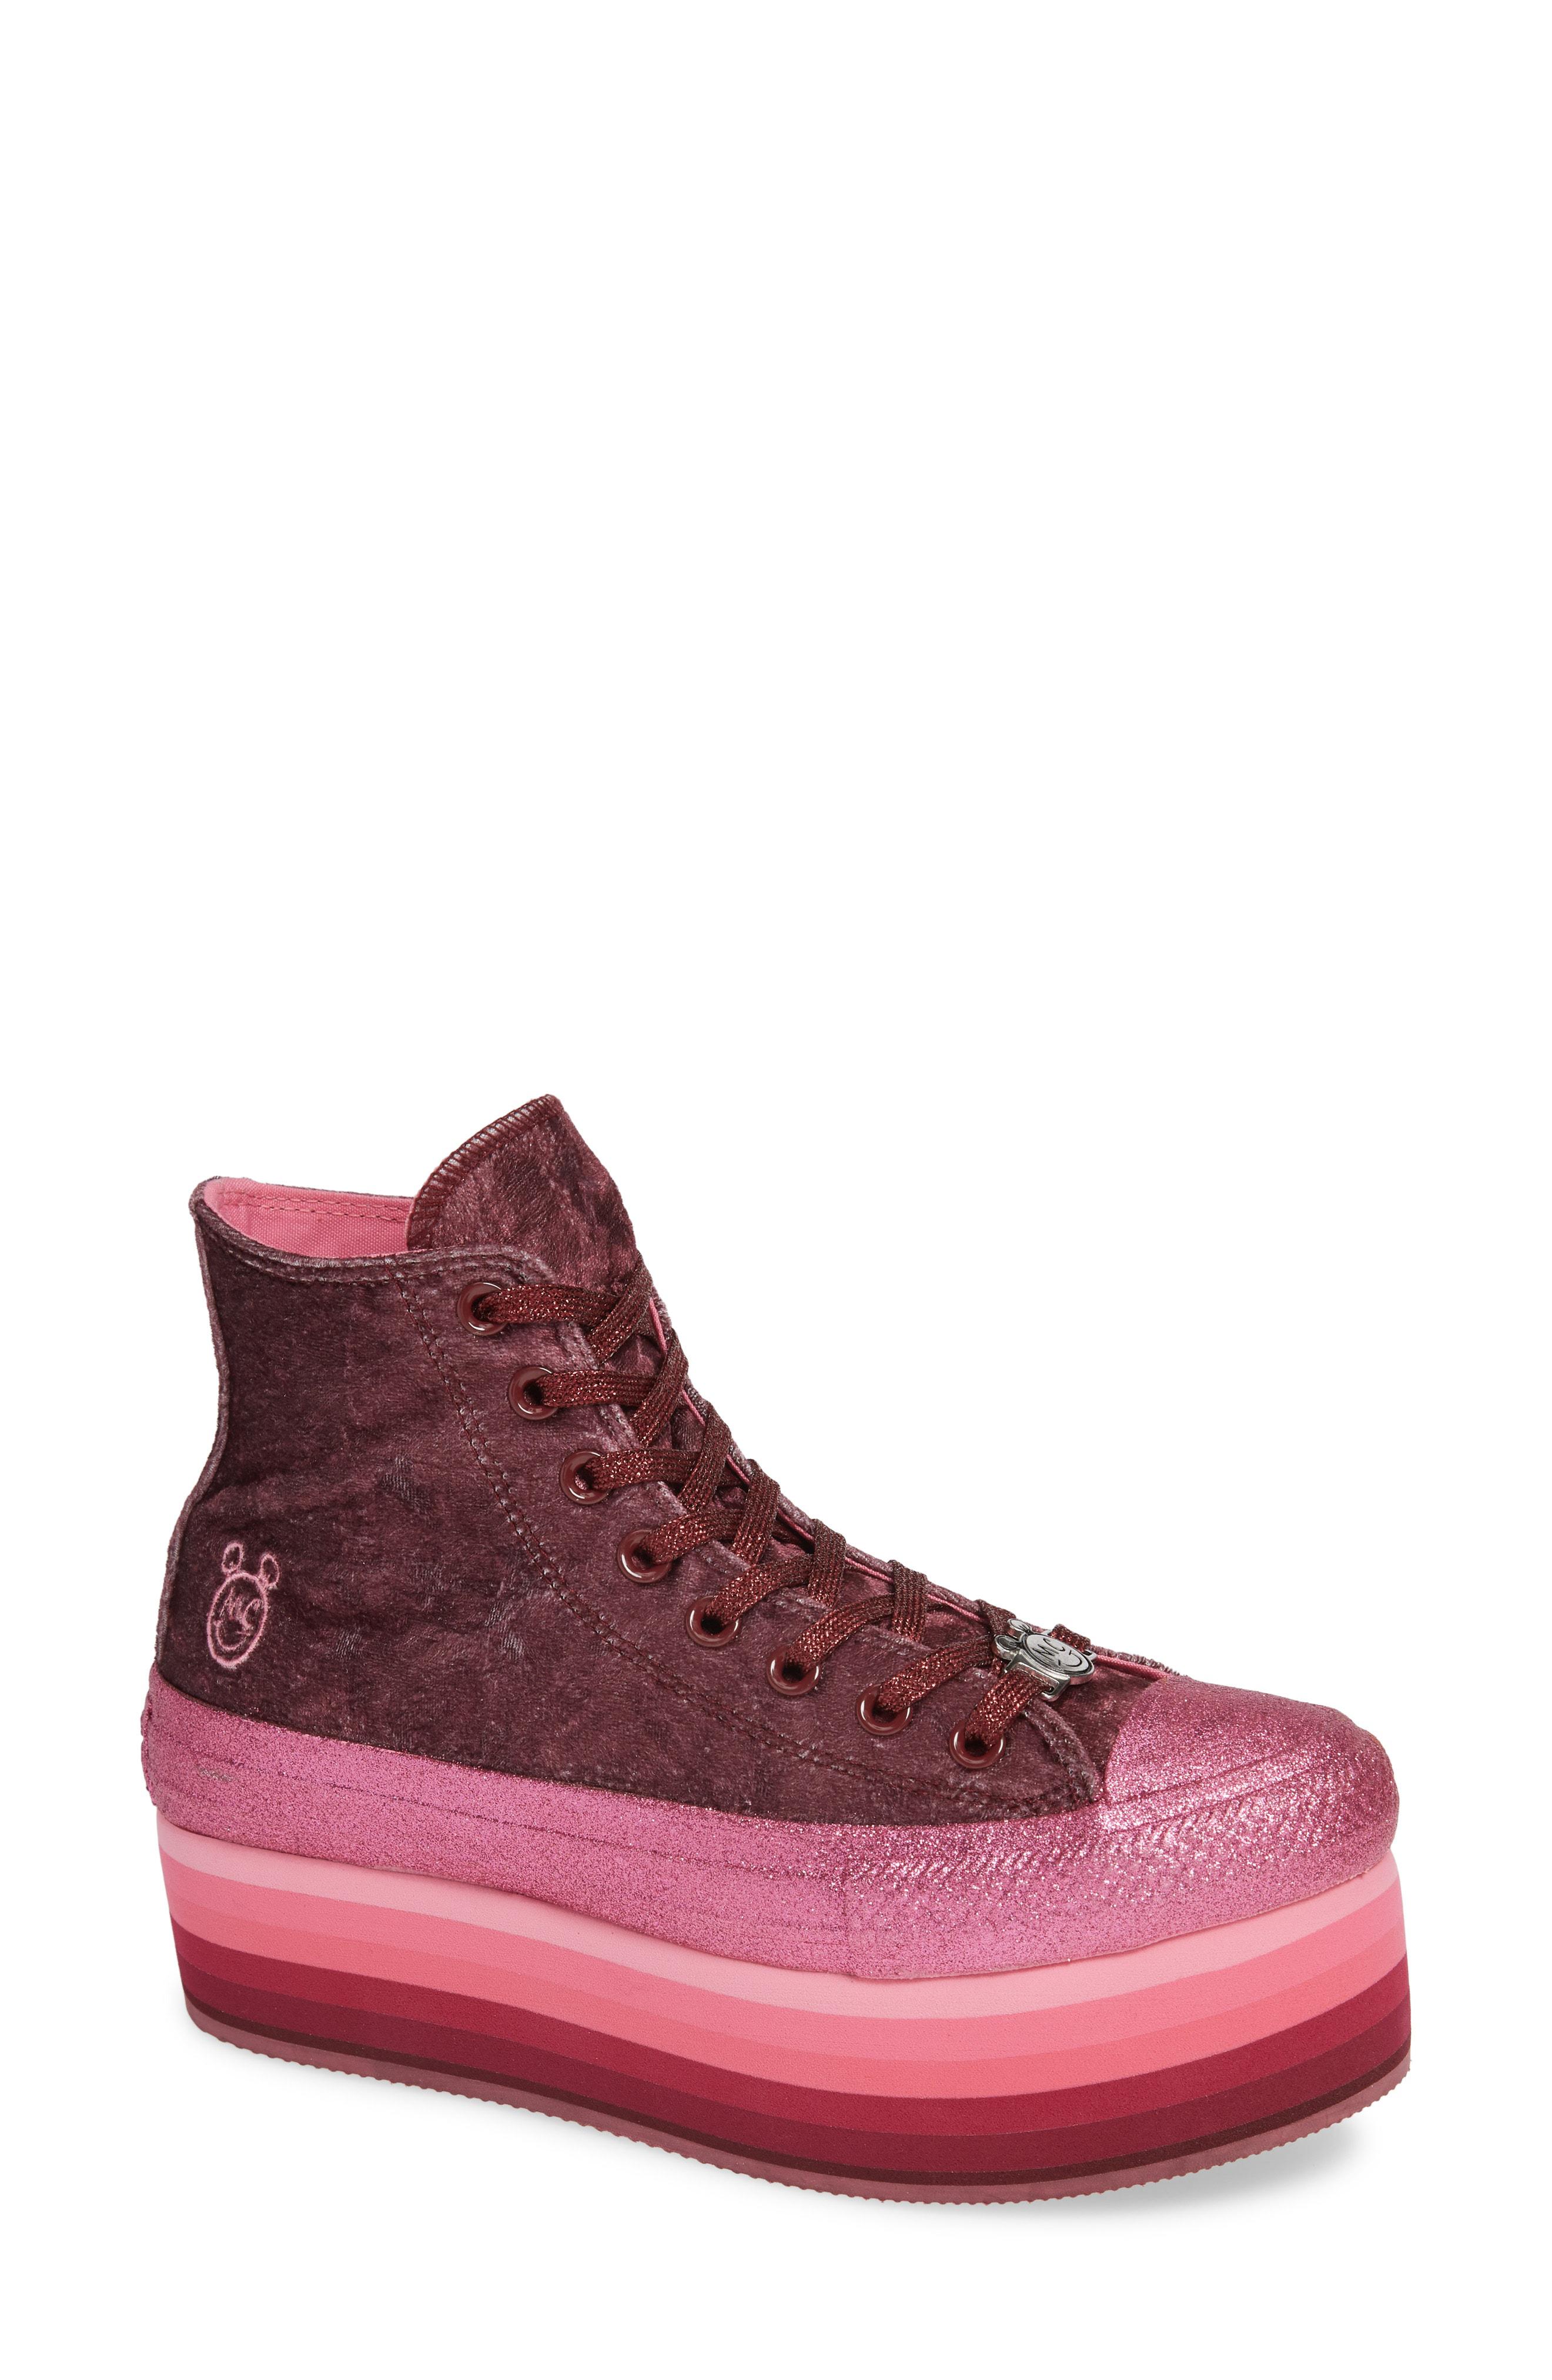 4fe0e81eea9f Converse X Miley Cyrus Chuck Taylor All-Star High-Top Platform Sneaker In  Dark